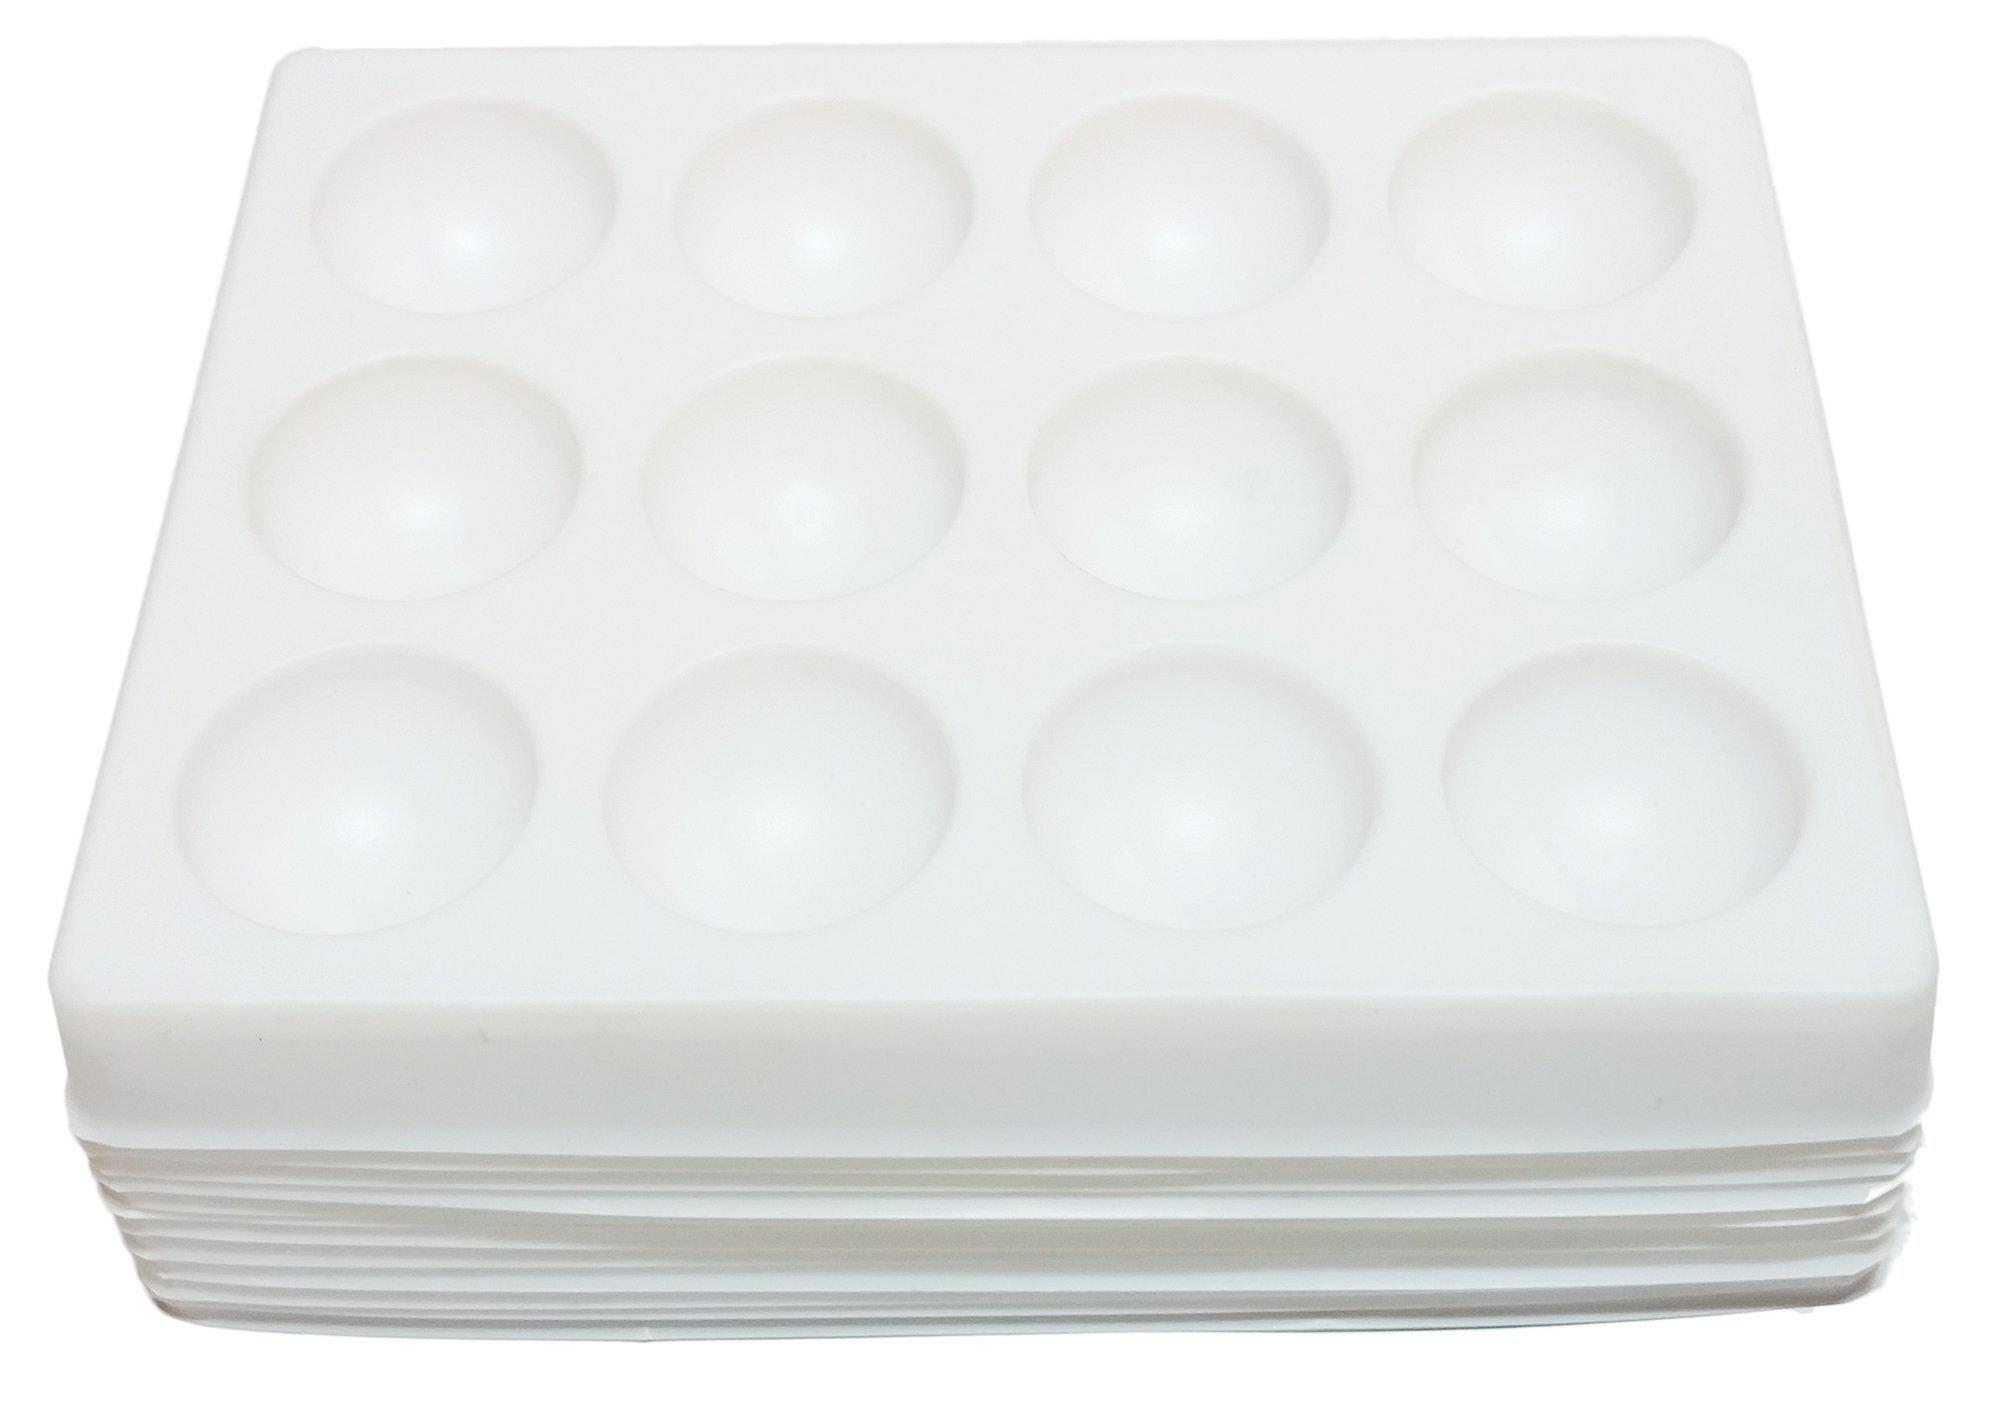 GSC International Polystyrene Spot Plates - Case of 120